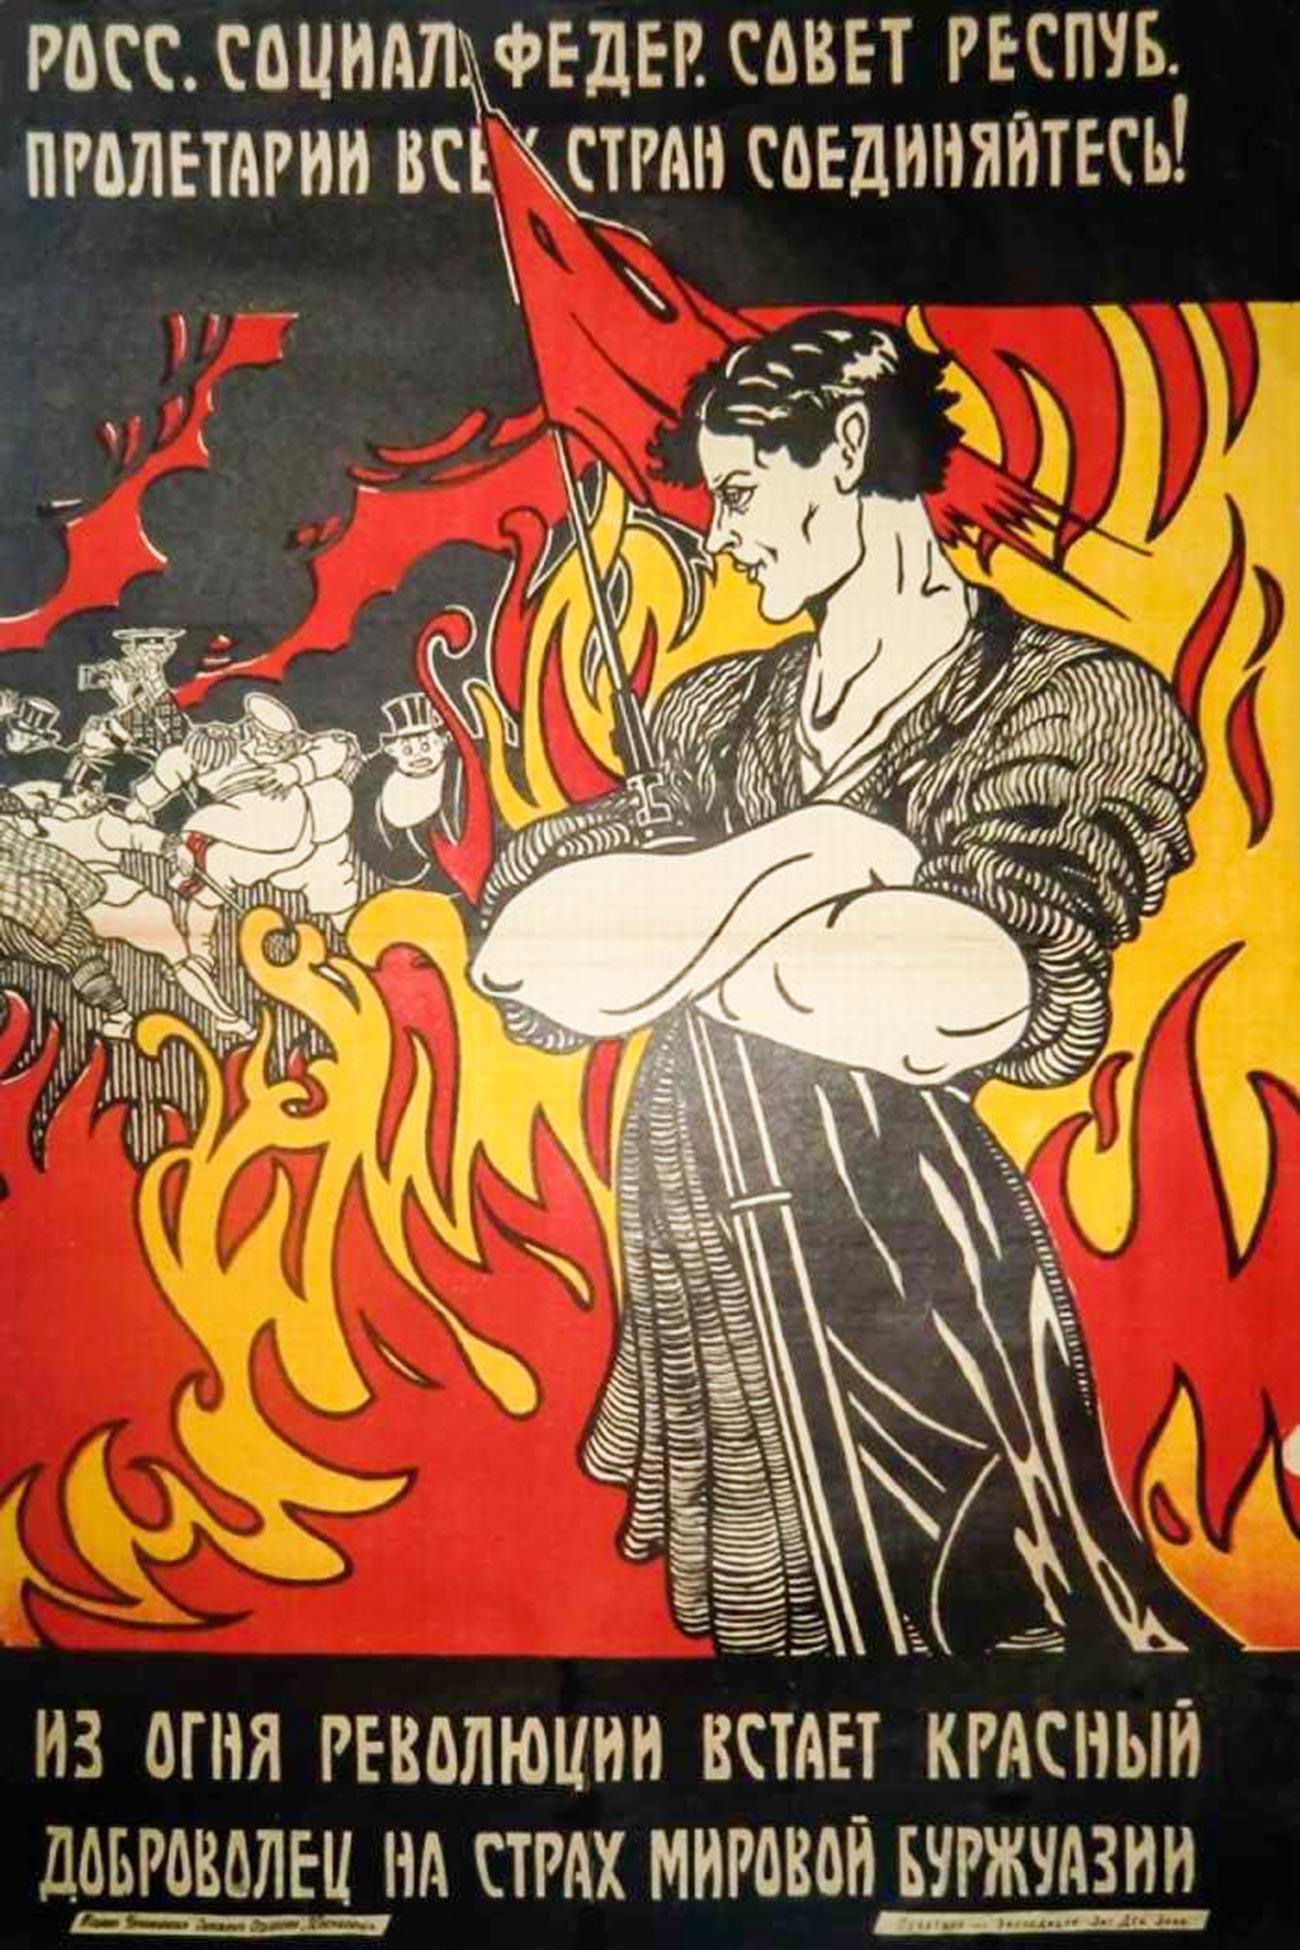 Republik Sosialis Federasi Soviet Rusia. Proletar dunia, bersatulah! Api revolusi akan melahirkan sukarelawan Merah, momok bagi borjuis global.